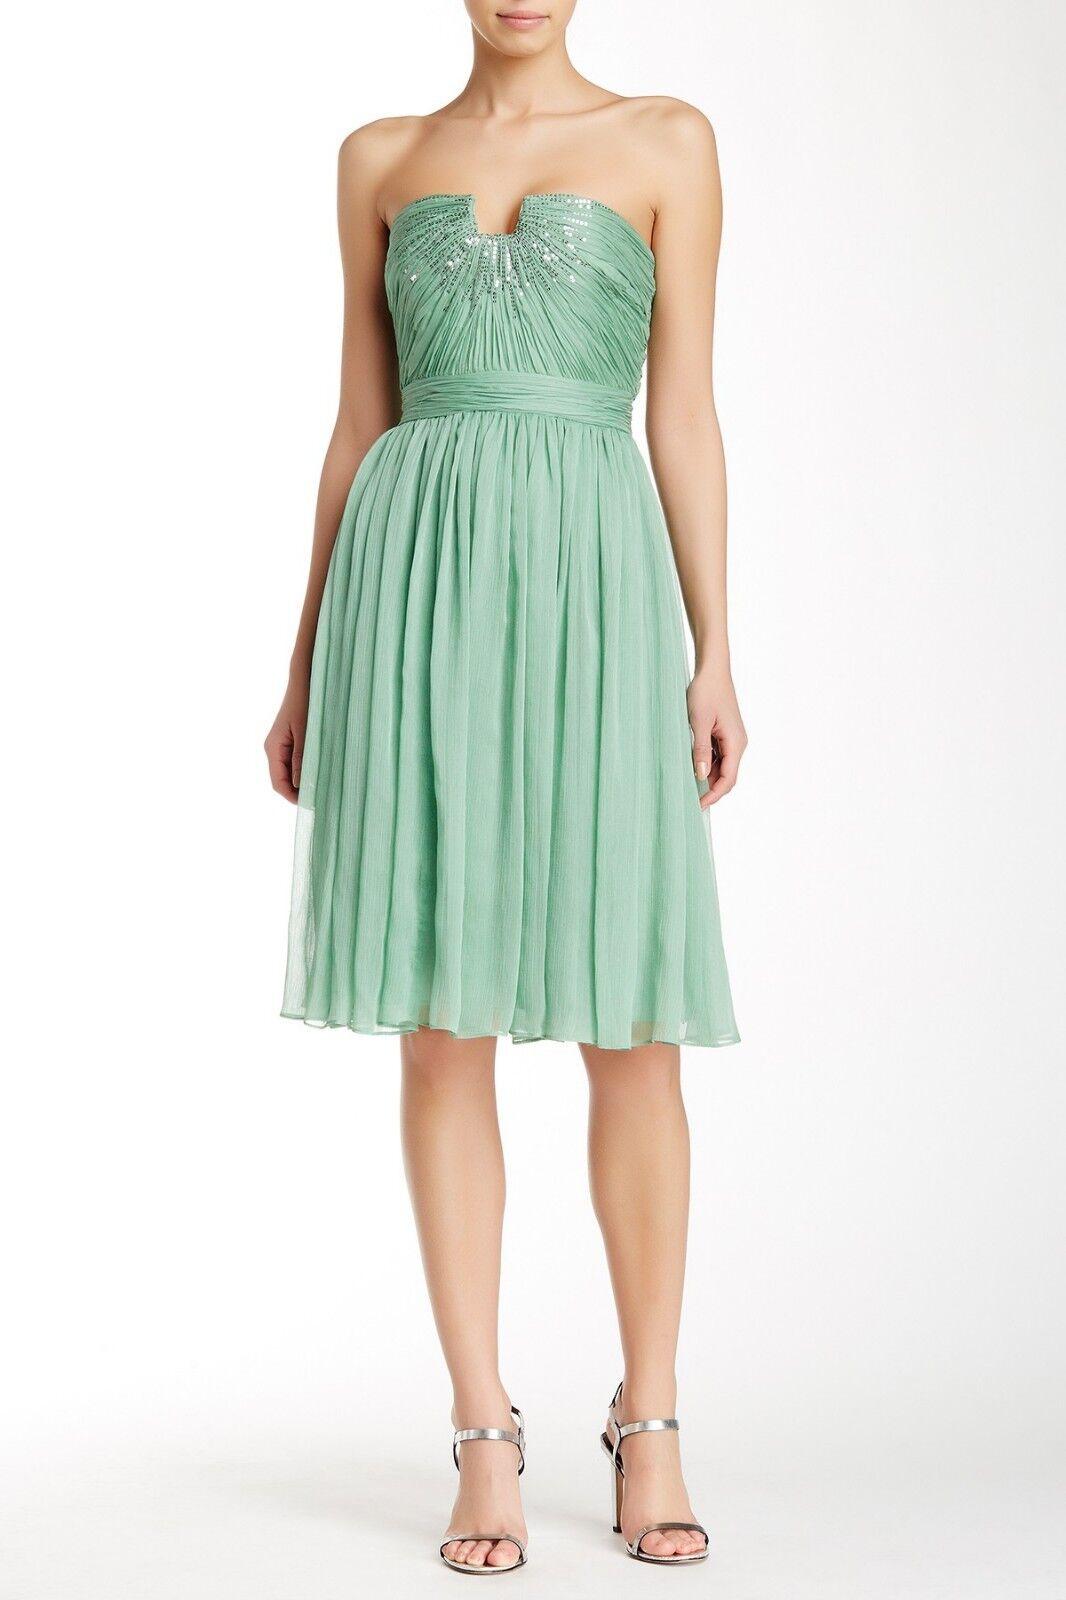 HALSTON HERITAGE Meadow Embellished Strapless Dress Größe 0 NEW